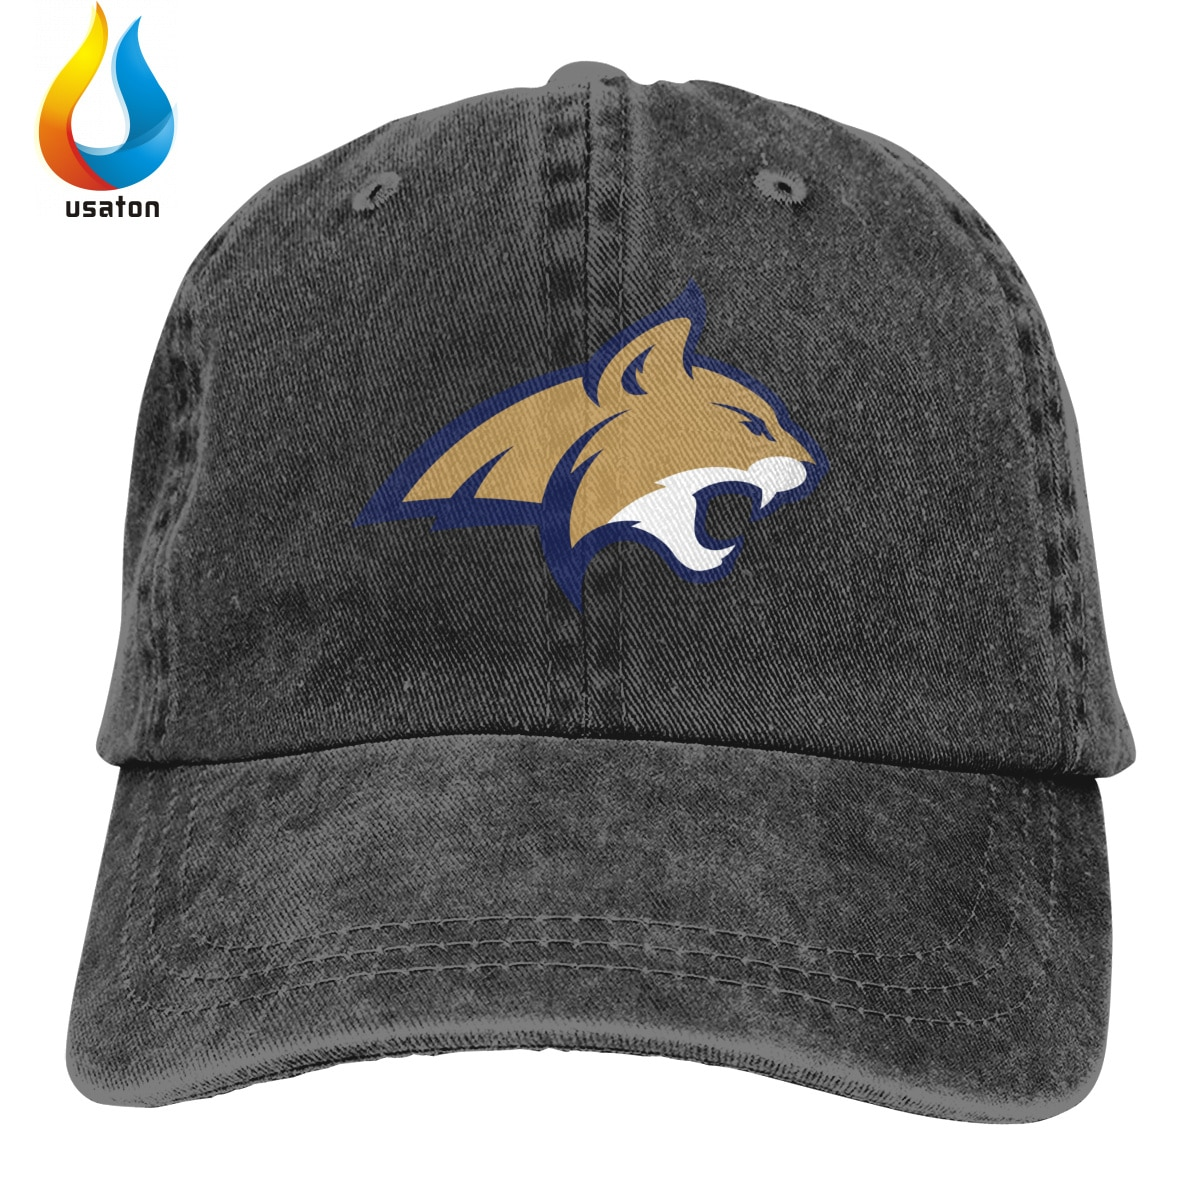 Gorra de béisbol de moda estampado 3D Montana estado gorras con logotipo hombres mujeres algodón al aire libre visera Simple Casual Cap